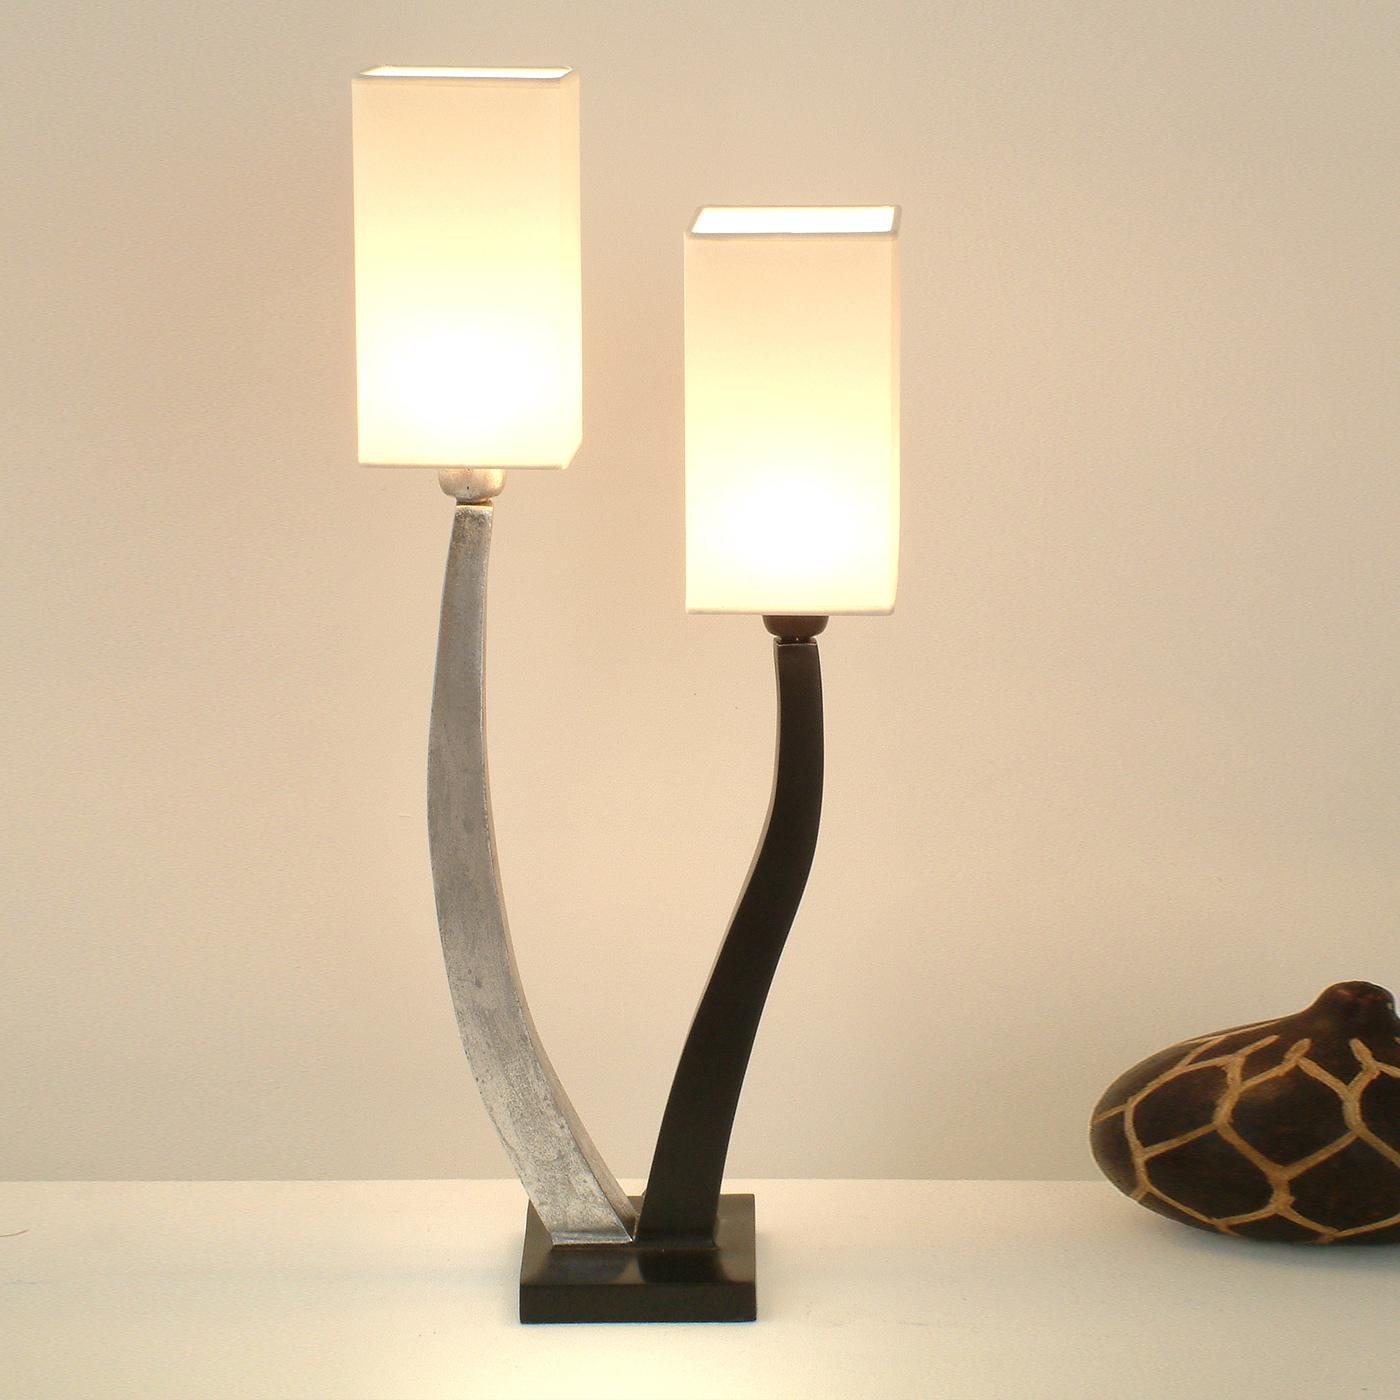 Quadrangolare Table Lamp 2-Light